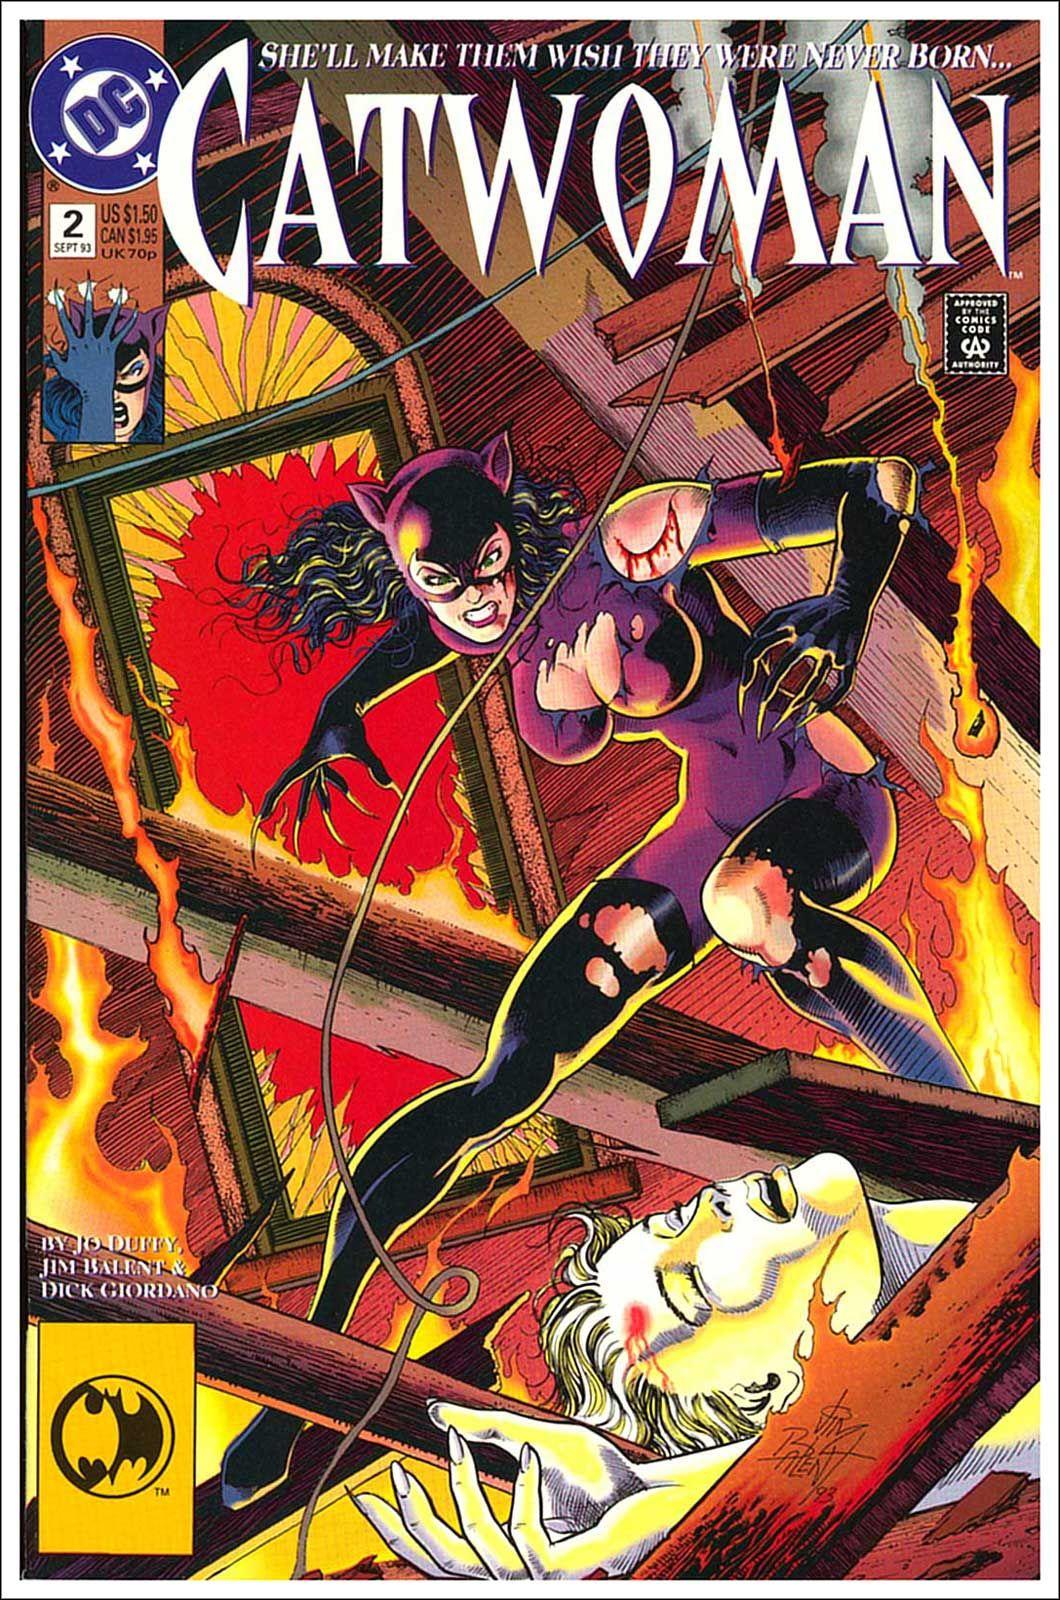 Comic Book Cover Art : Vintage comic book covers viewliner ltd